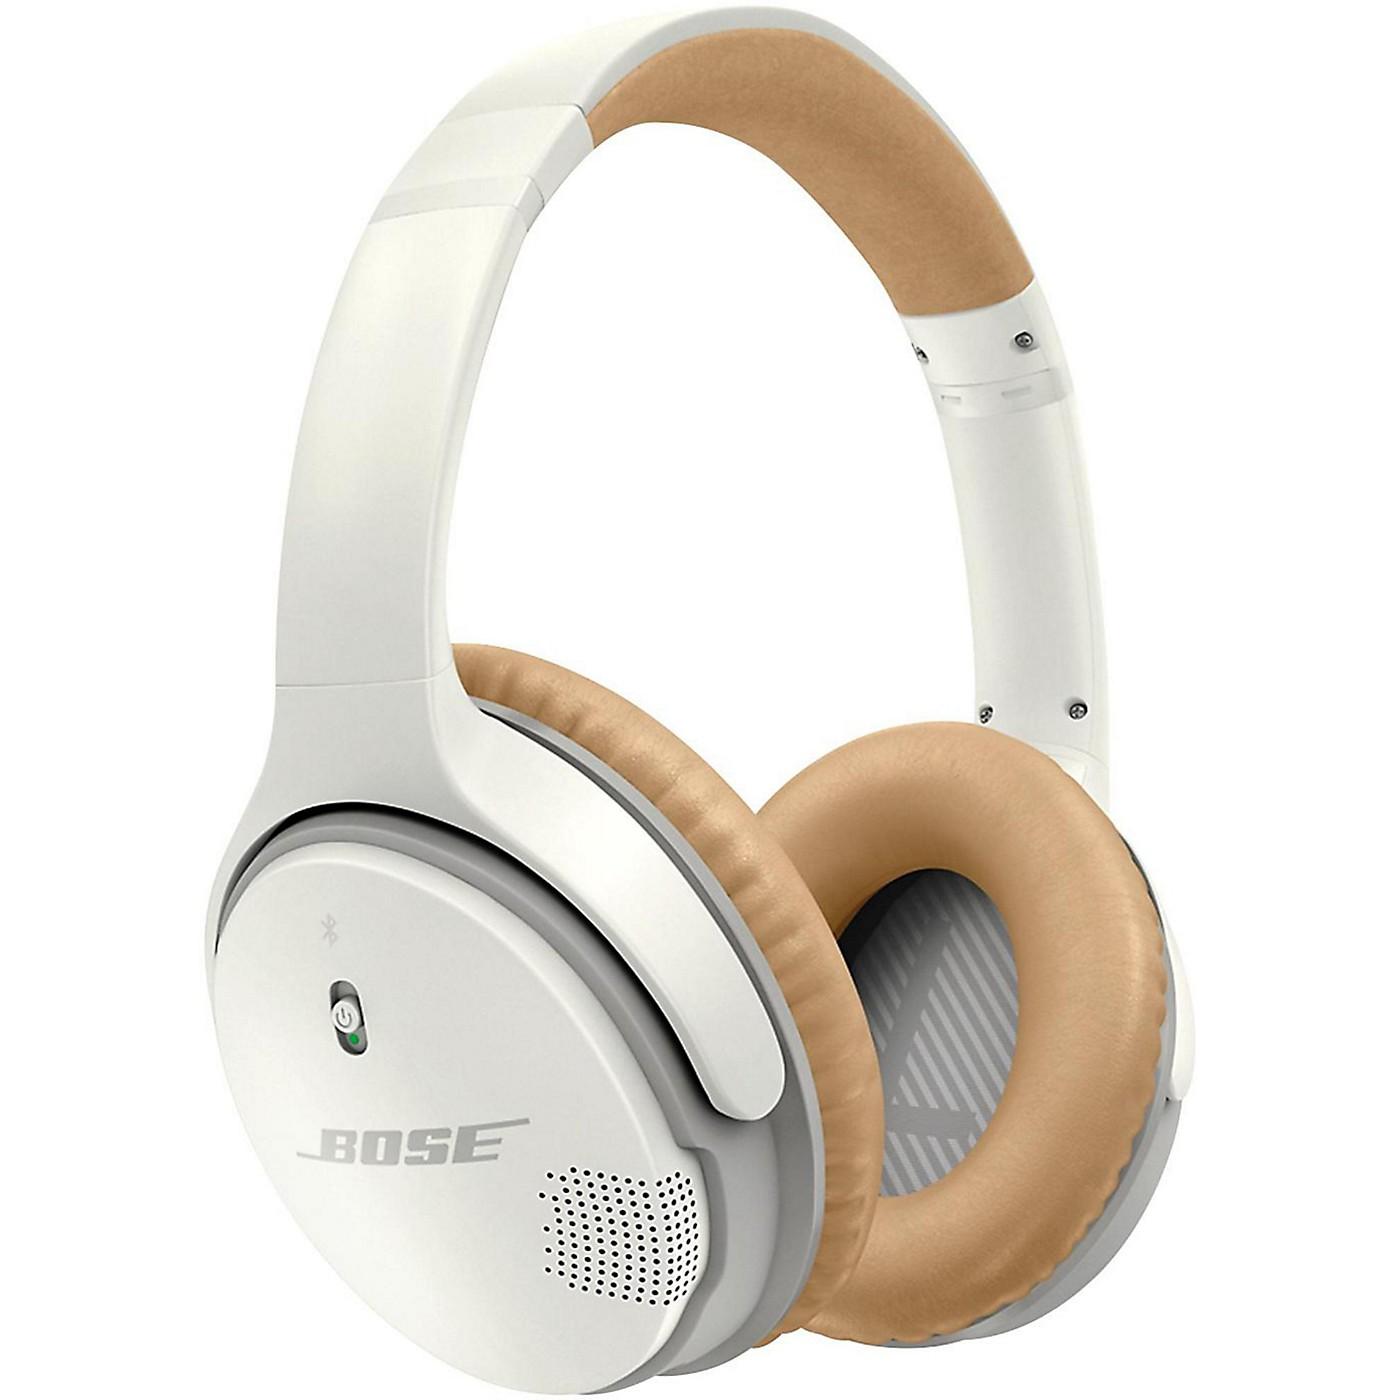 Bose SoundLink II Around-Ear Wireless Headphones thumbnail